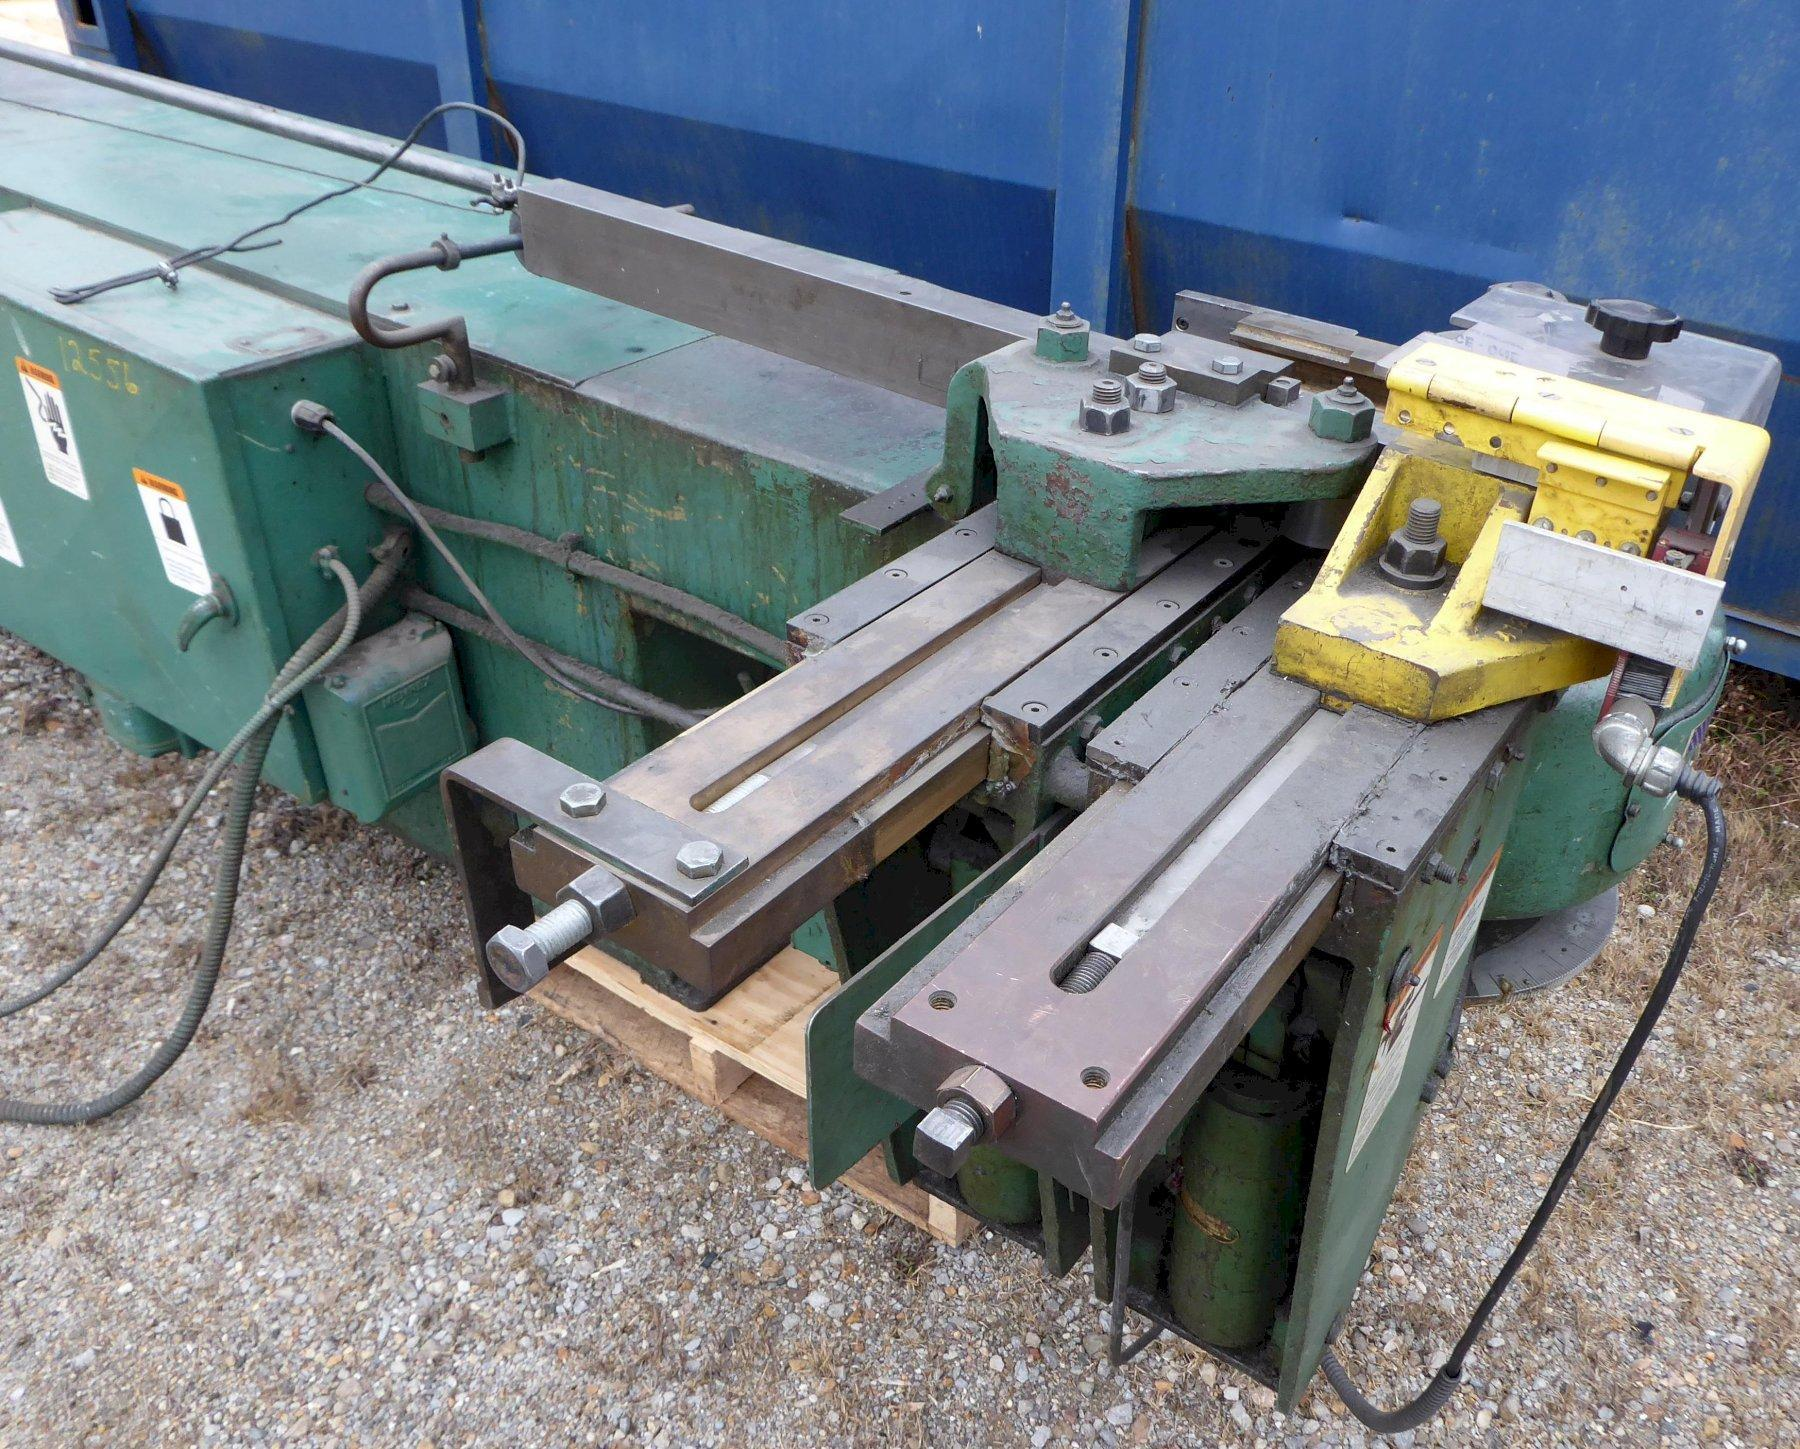 No. 2 Pines Horizontal Bender w/Mandrel Extractor, Low Price